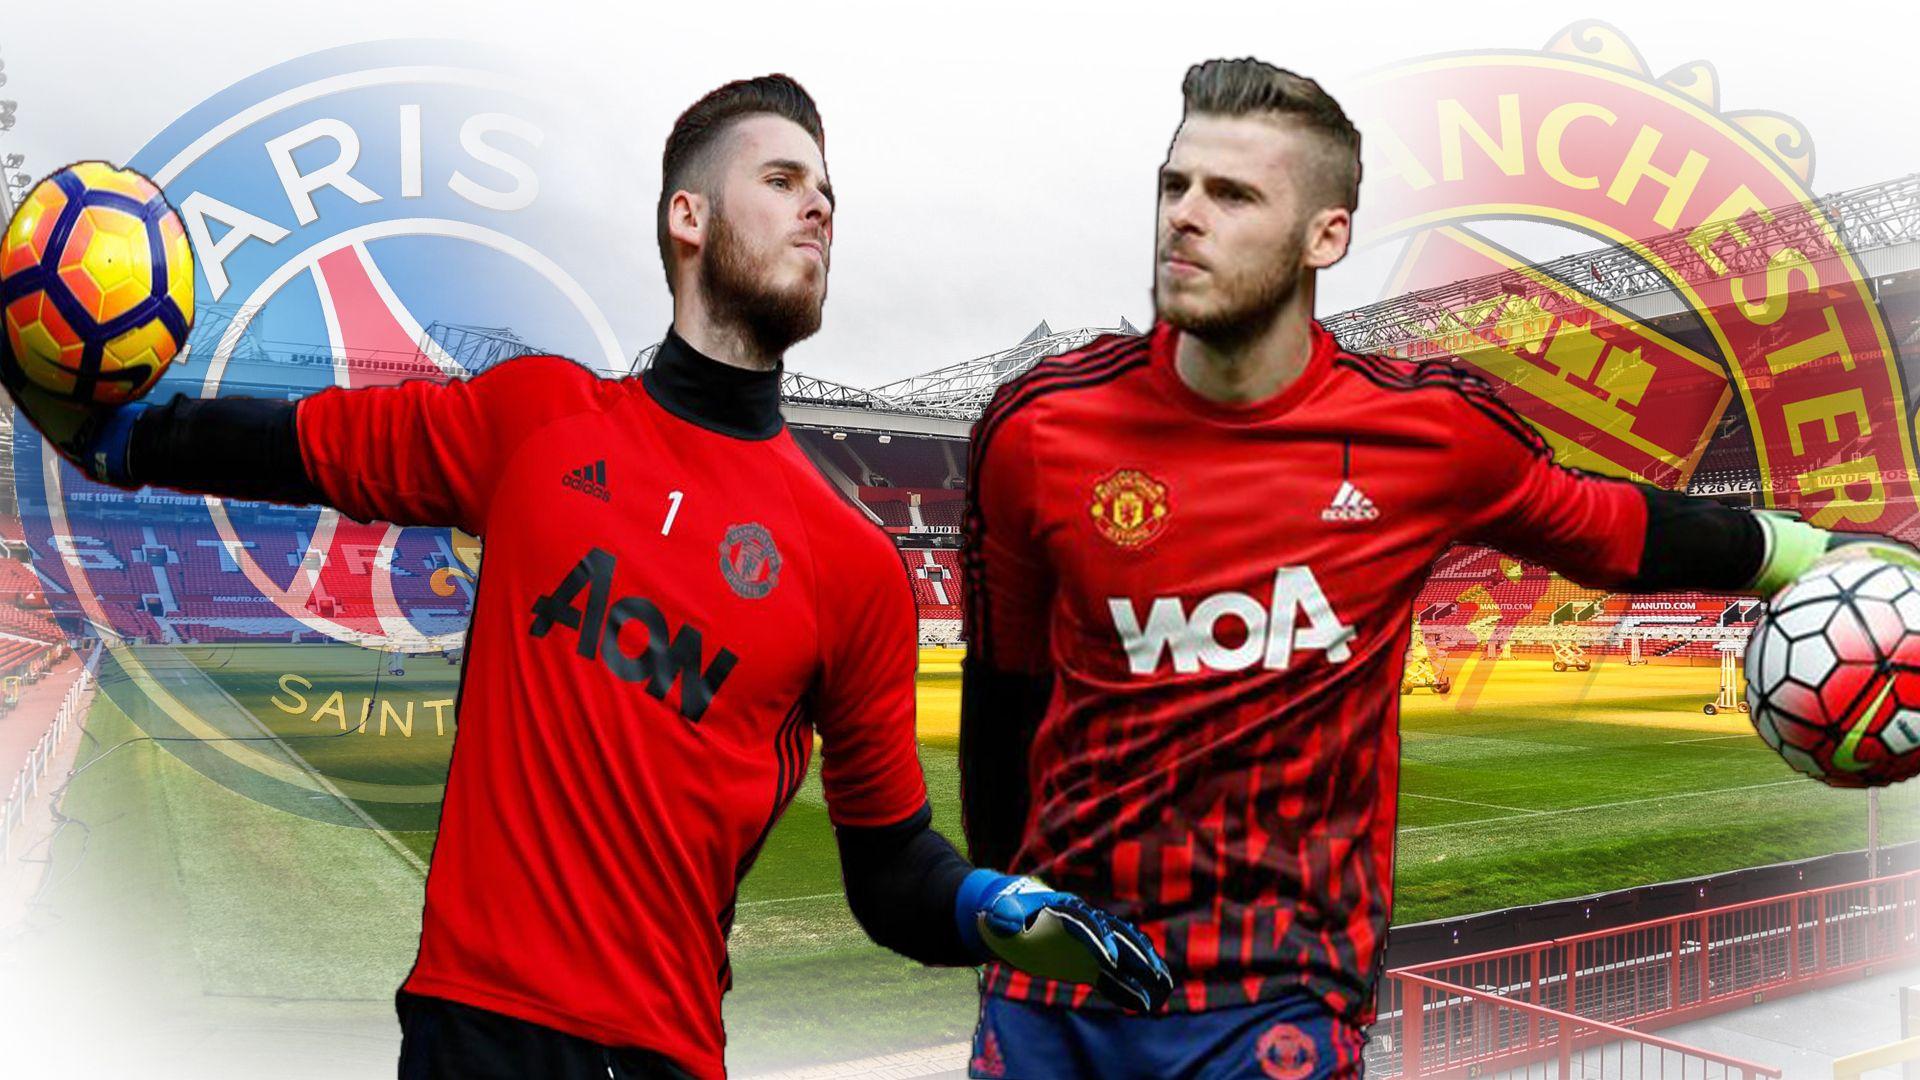 PSG ready offer for Manchester United star David De Gea